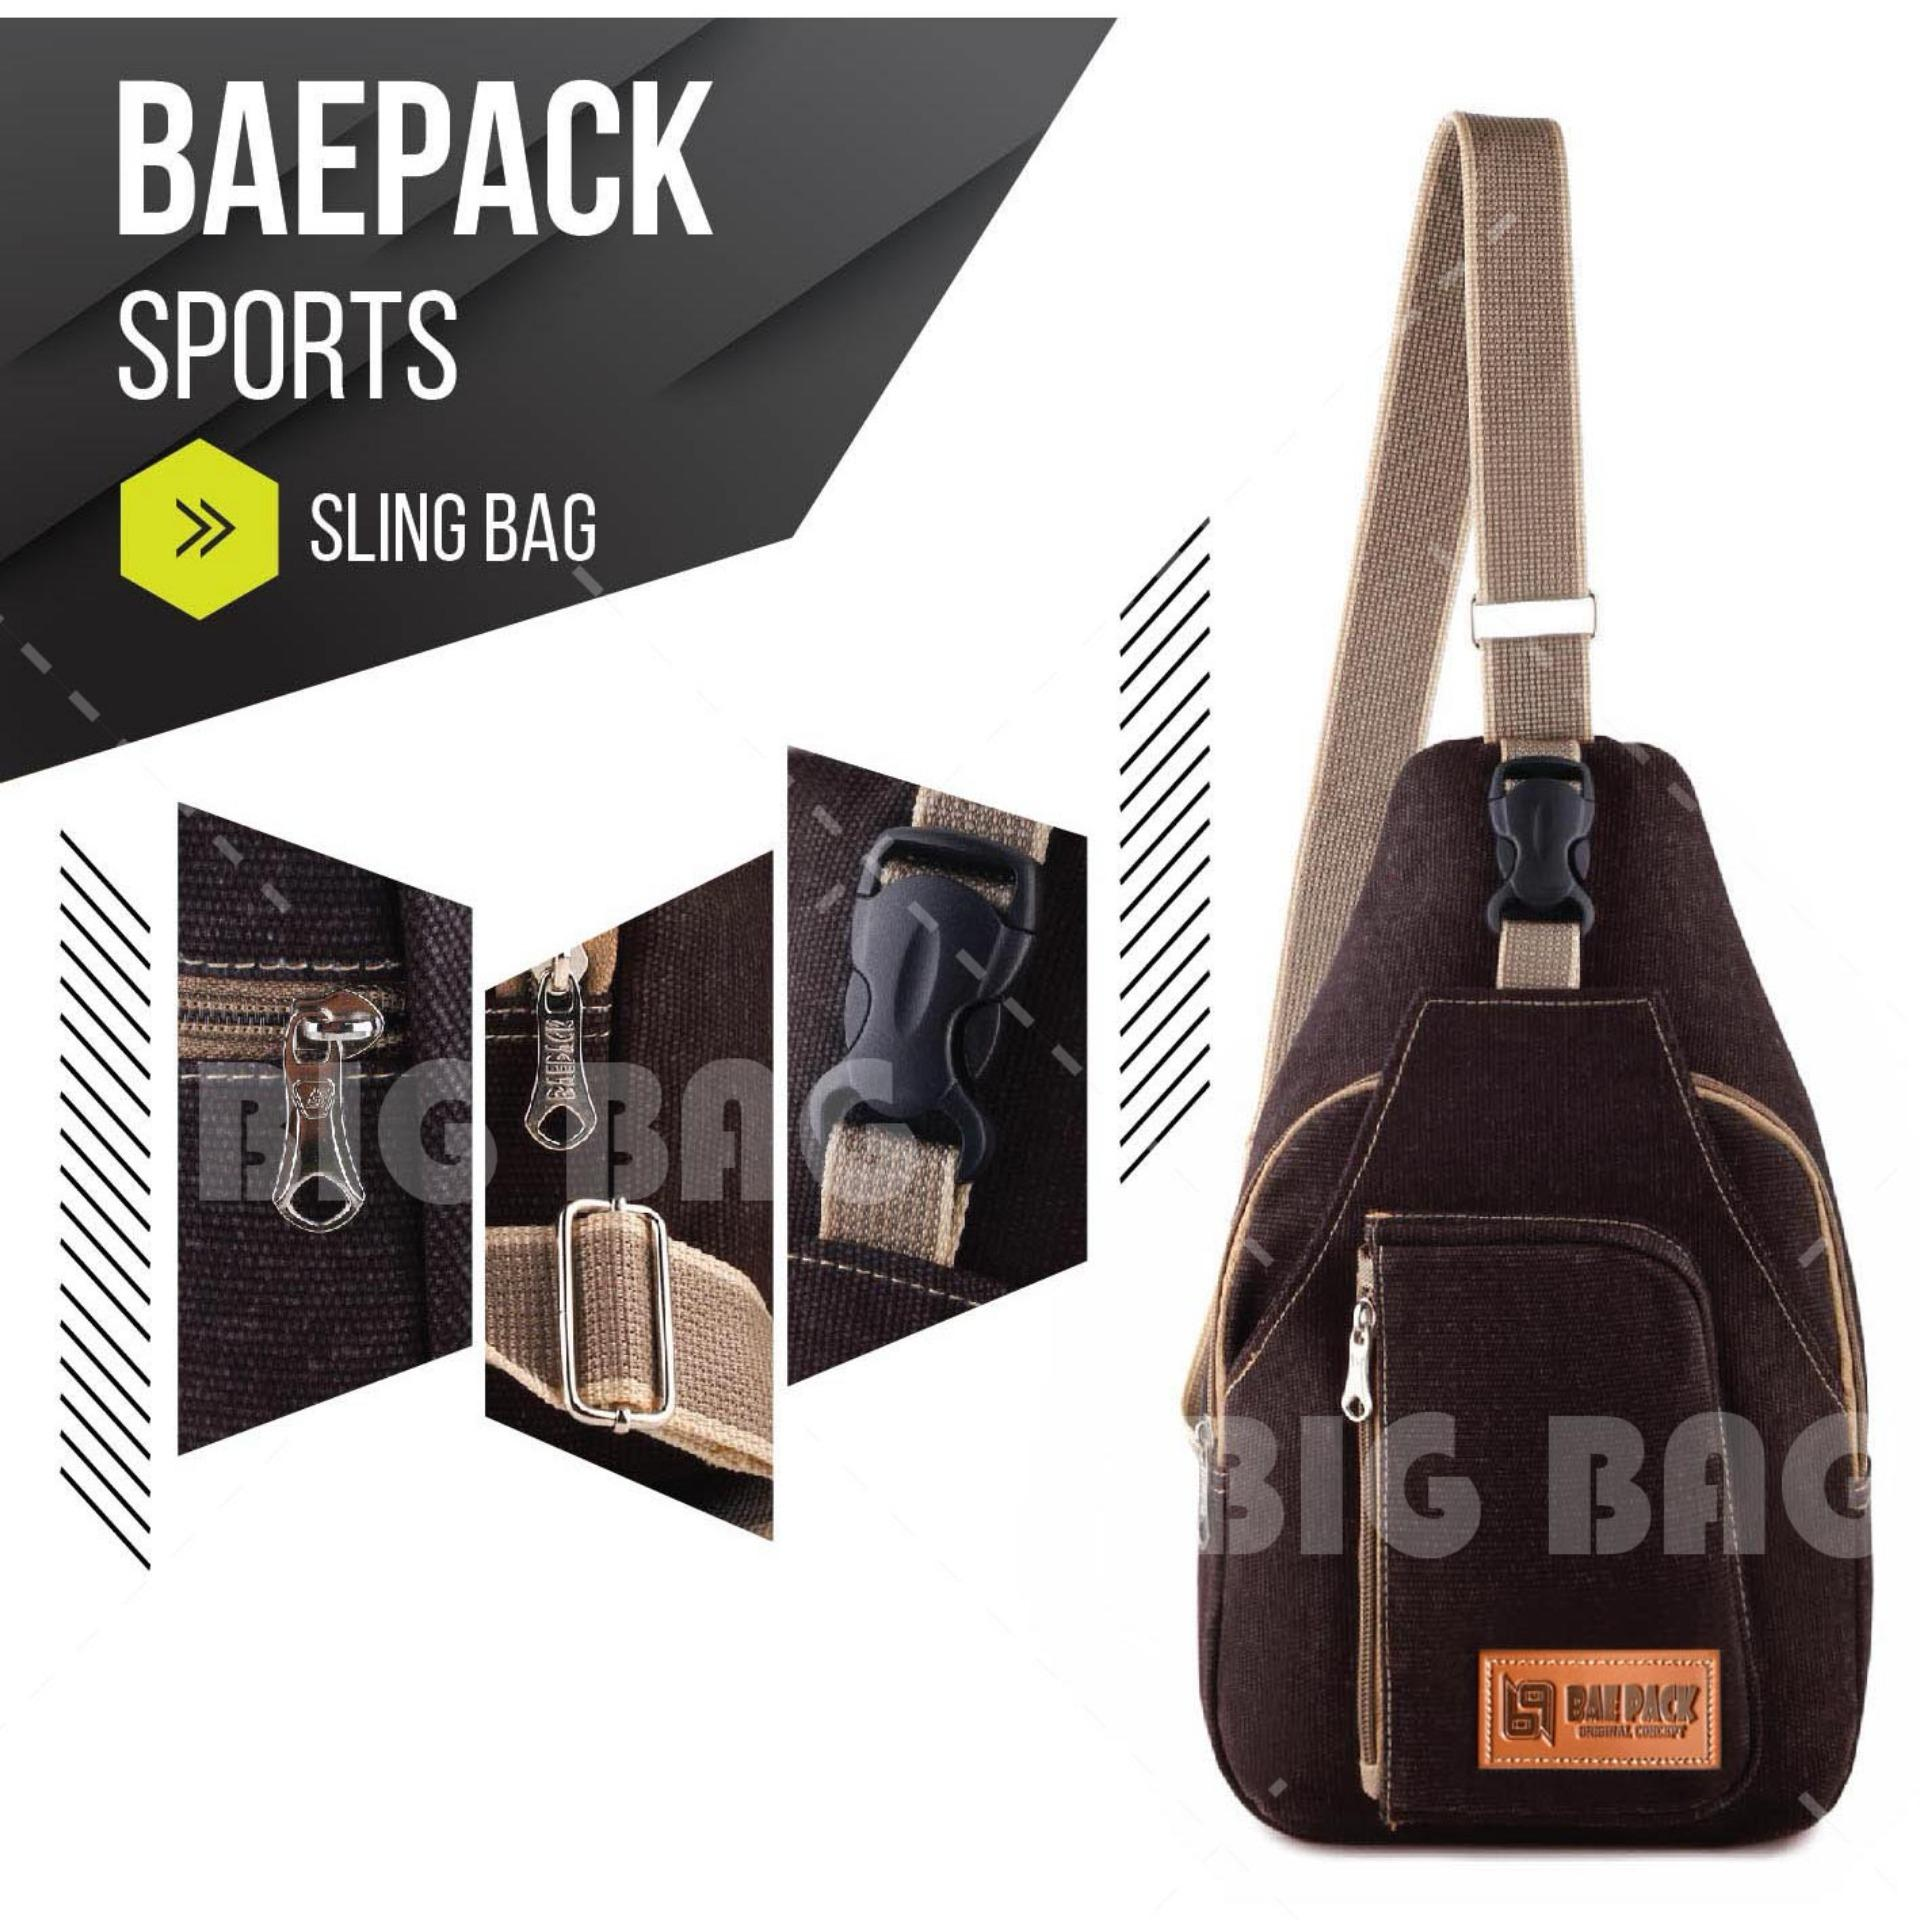 Tas Selempang Pria / Wanita Canvas Kanvas Baepack SPORTS - Slingbag - Coffee - Tas Messenger Shoulder Bag Chest Bag Slempang Import Korean Style Converse ...